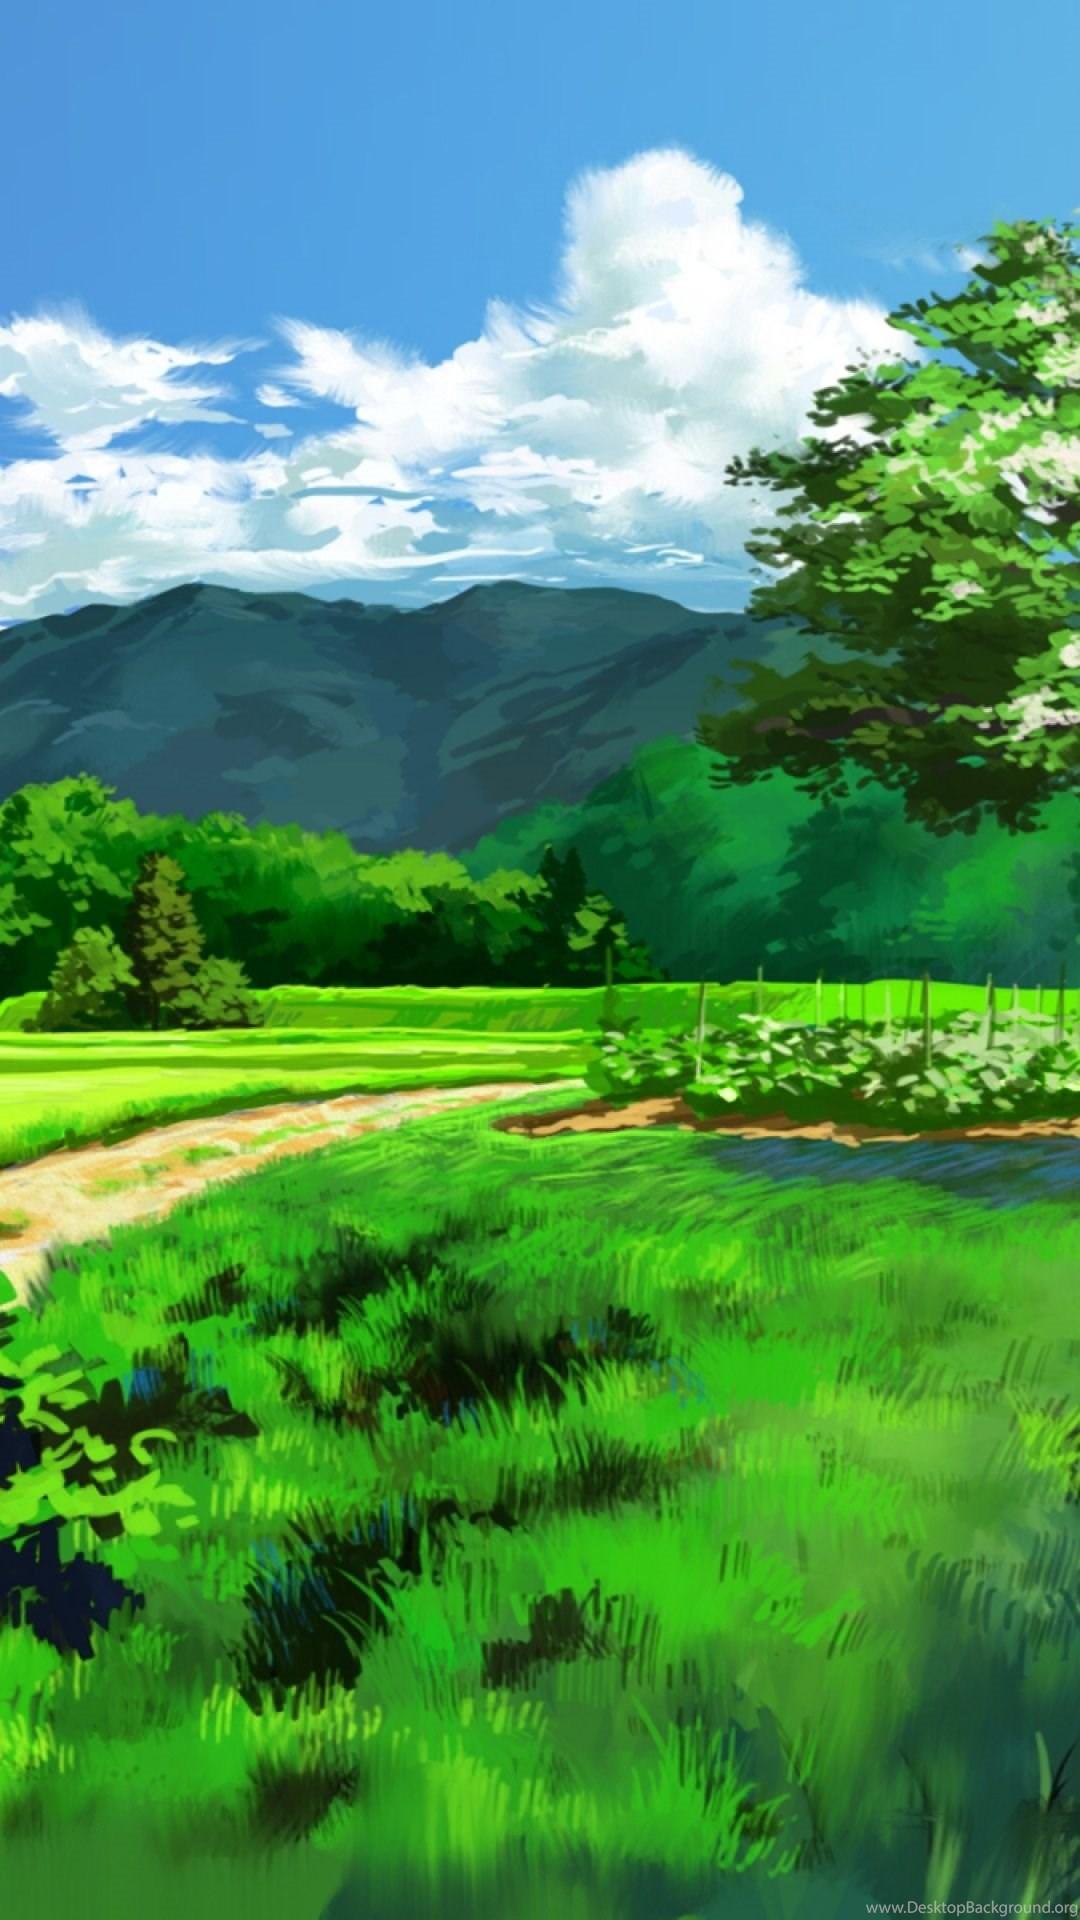 Anime Landscape Dual Screen S4 Wallpapers Desktop Background